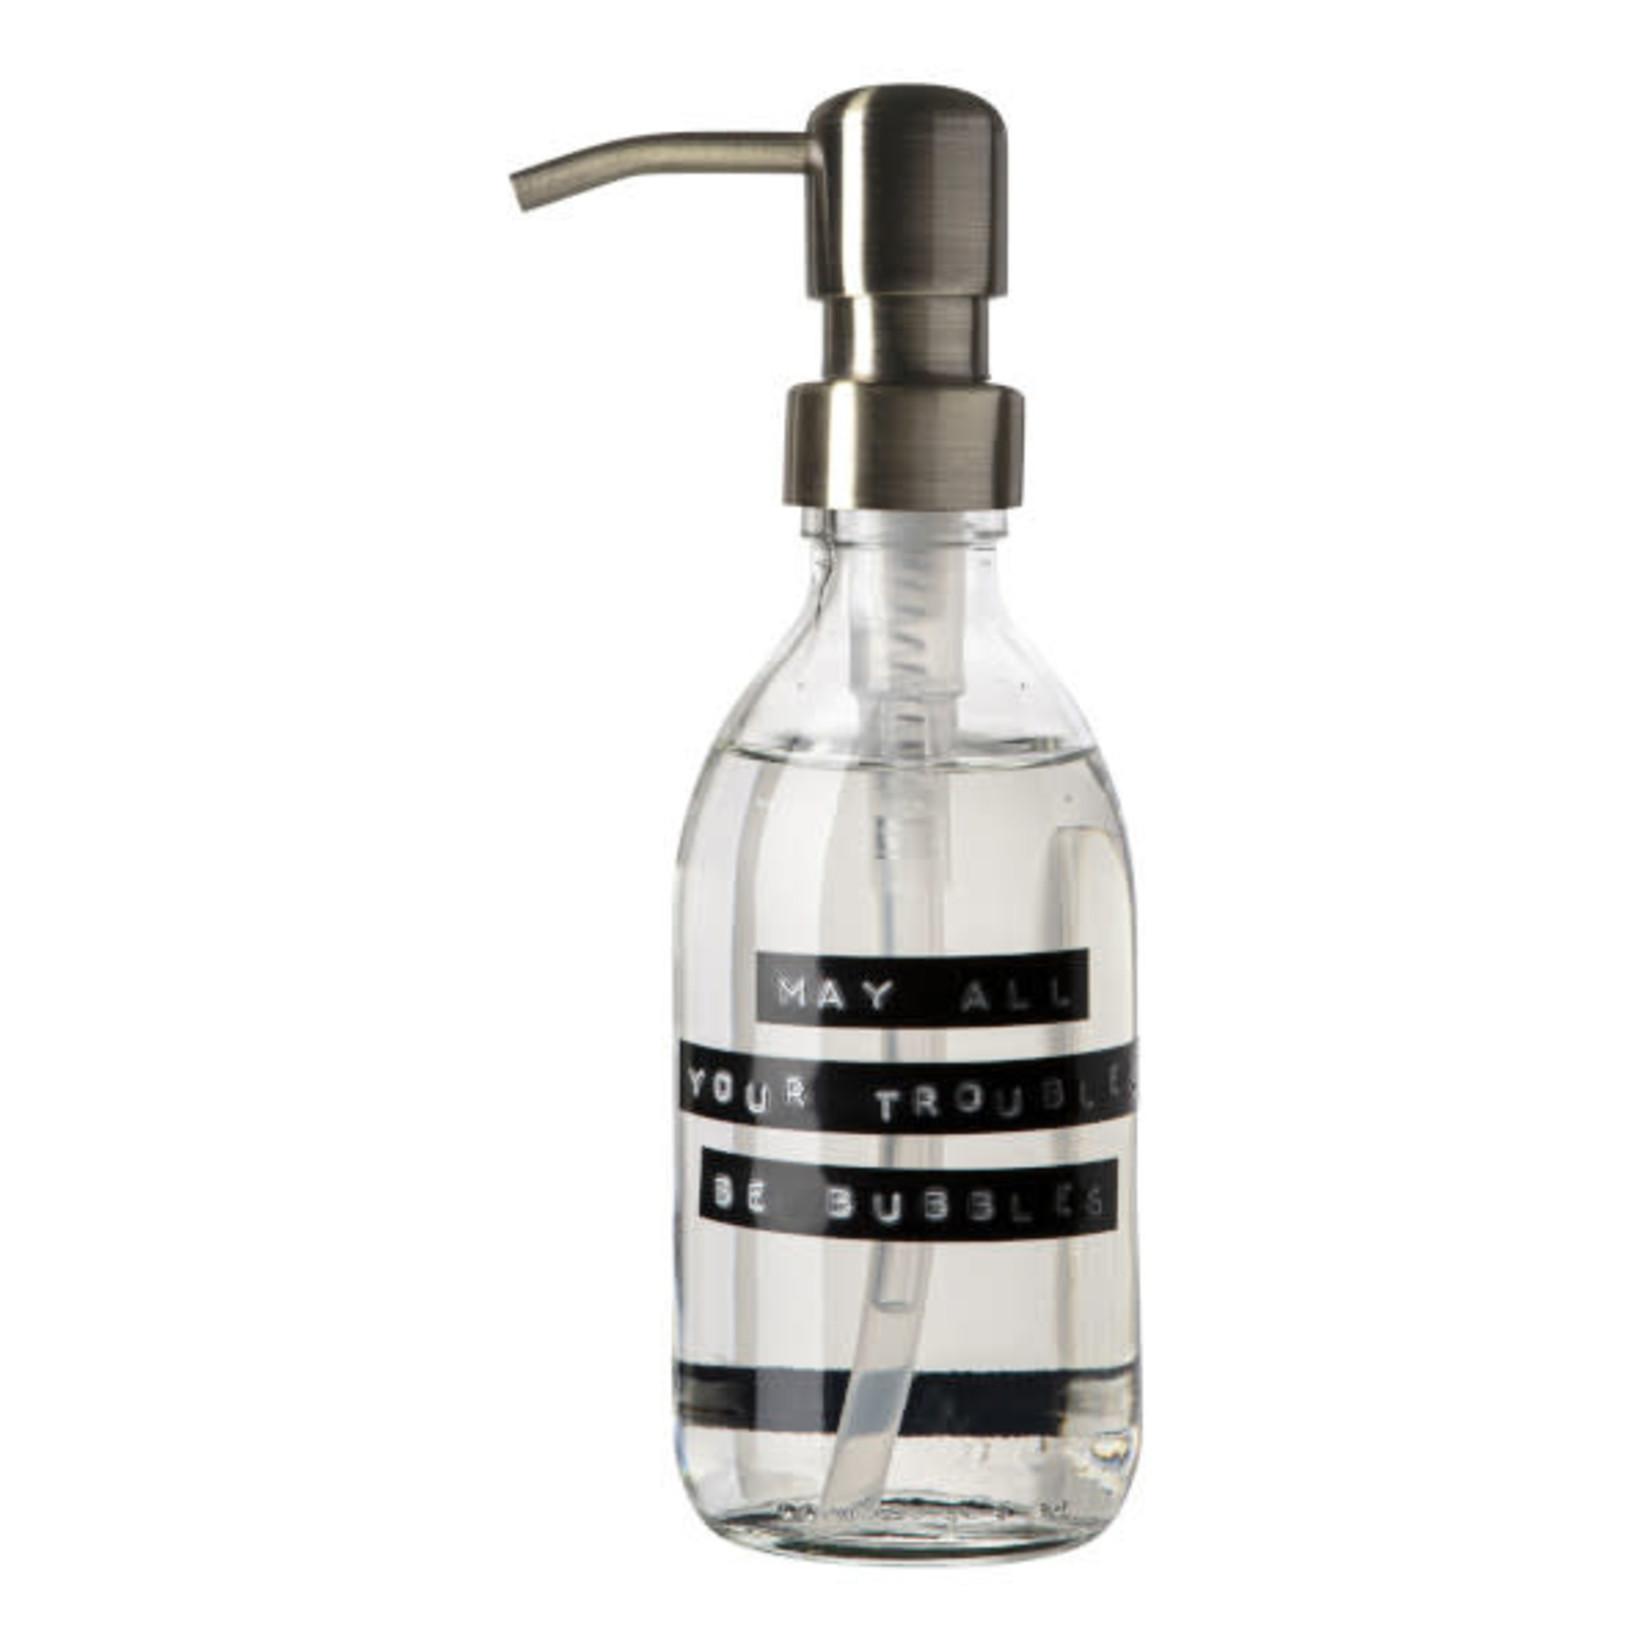 WELLmark WELLmark Zeeppomp helder glas - messing - 250ml handzeep frisse linnen 'May all your troubles be bubbles'